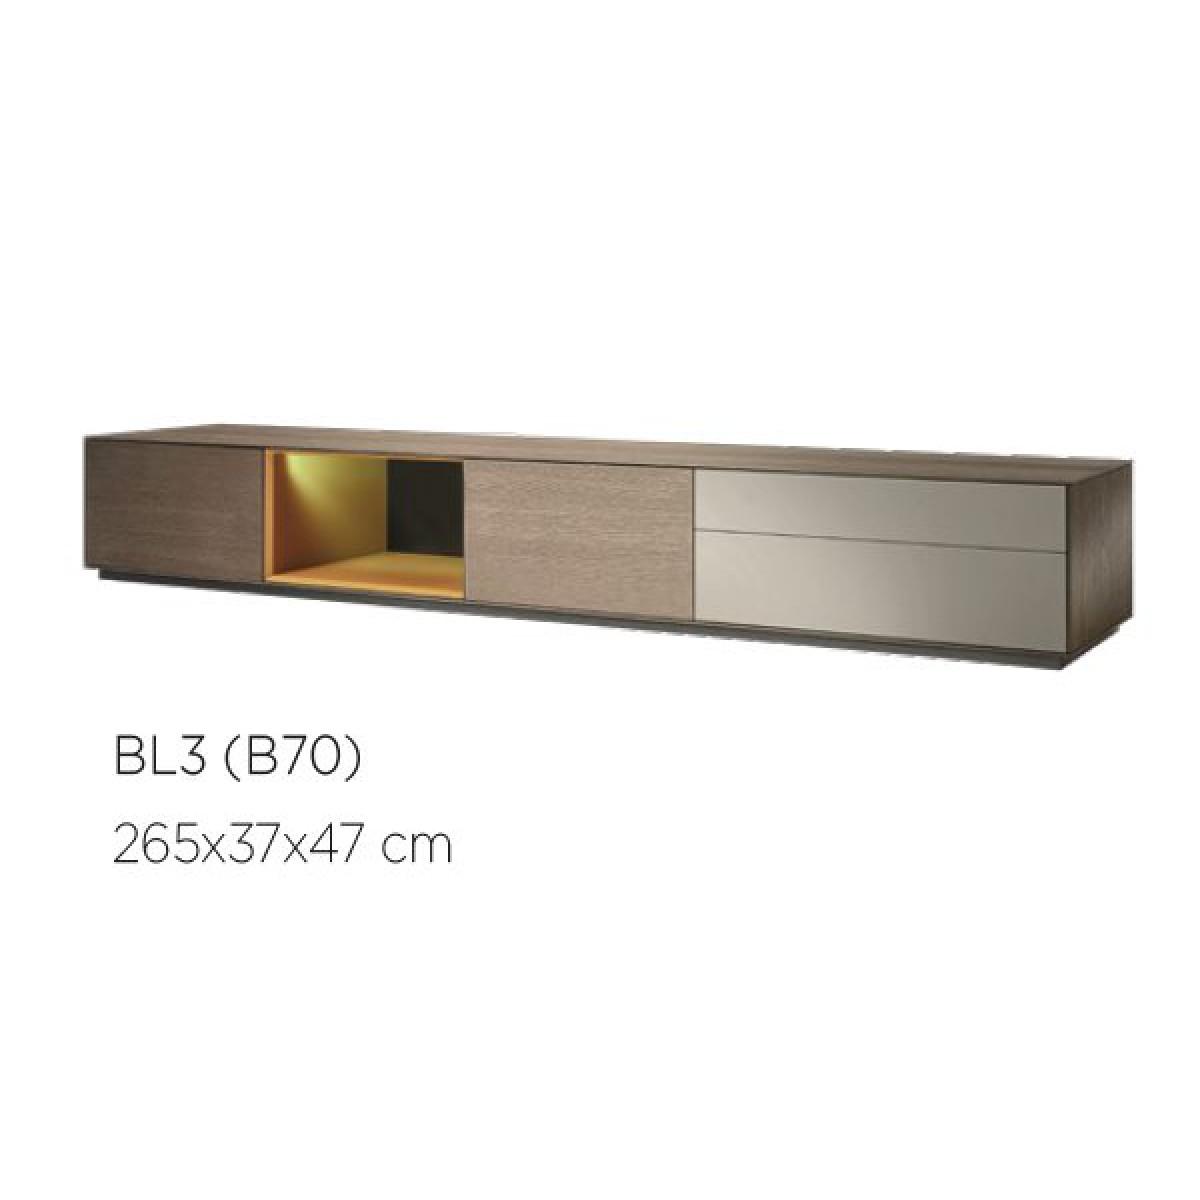 tv-meubel-sokkel-dressoir-bloom-eiken-BL3-miltonhouse-plint-hangend